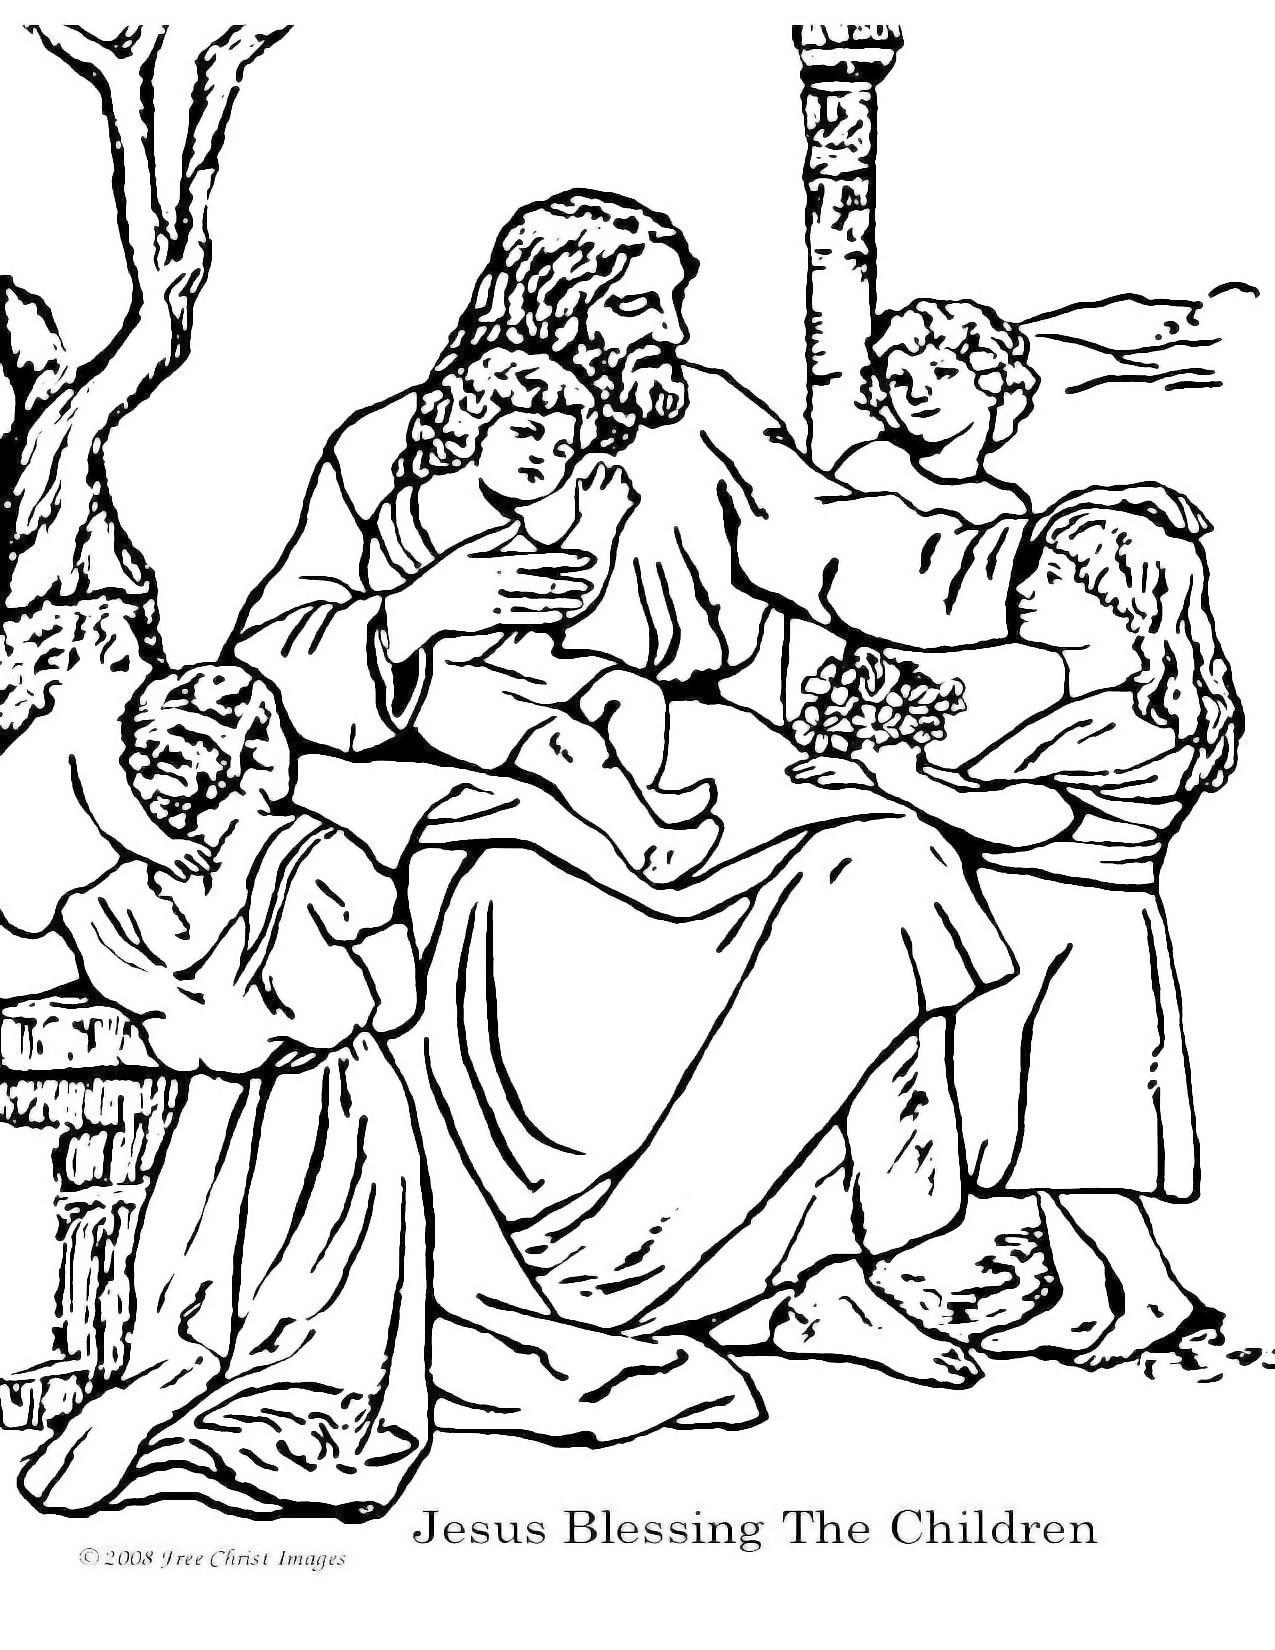 Jesus blesses the children church lesson pinterest for Jesus blesses the children coloring page